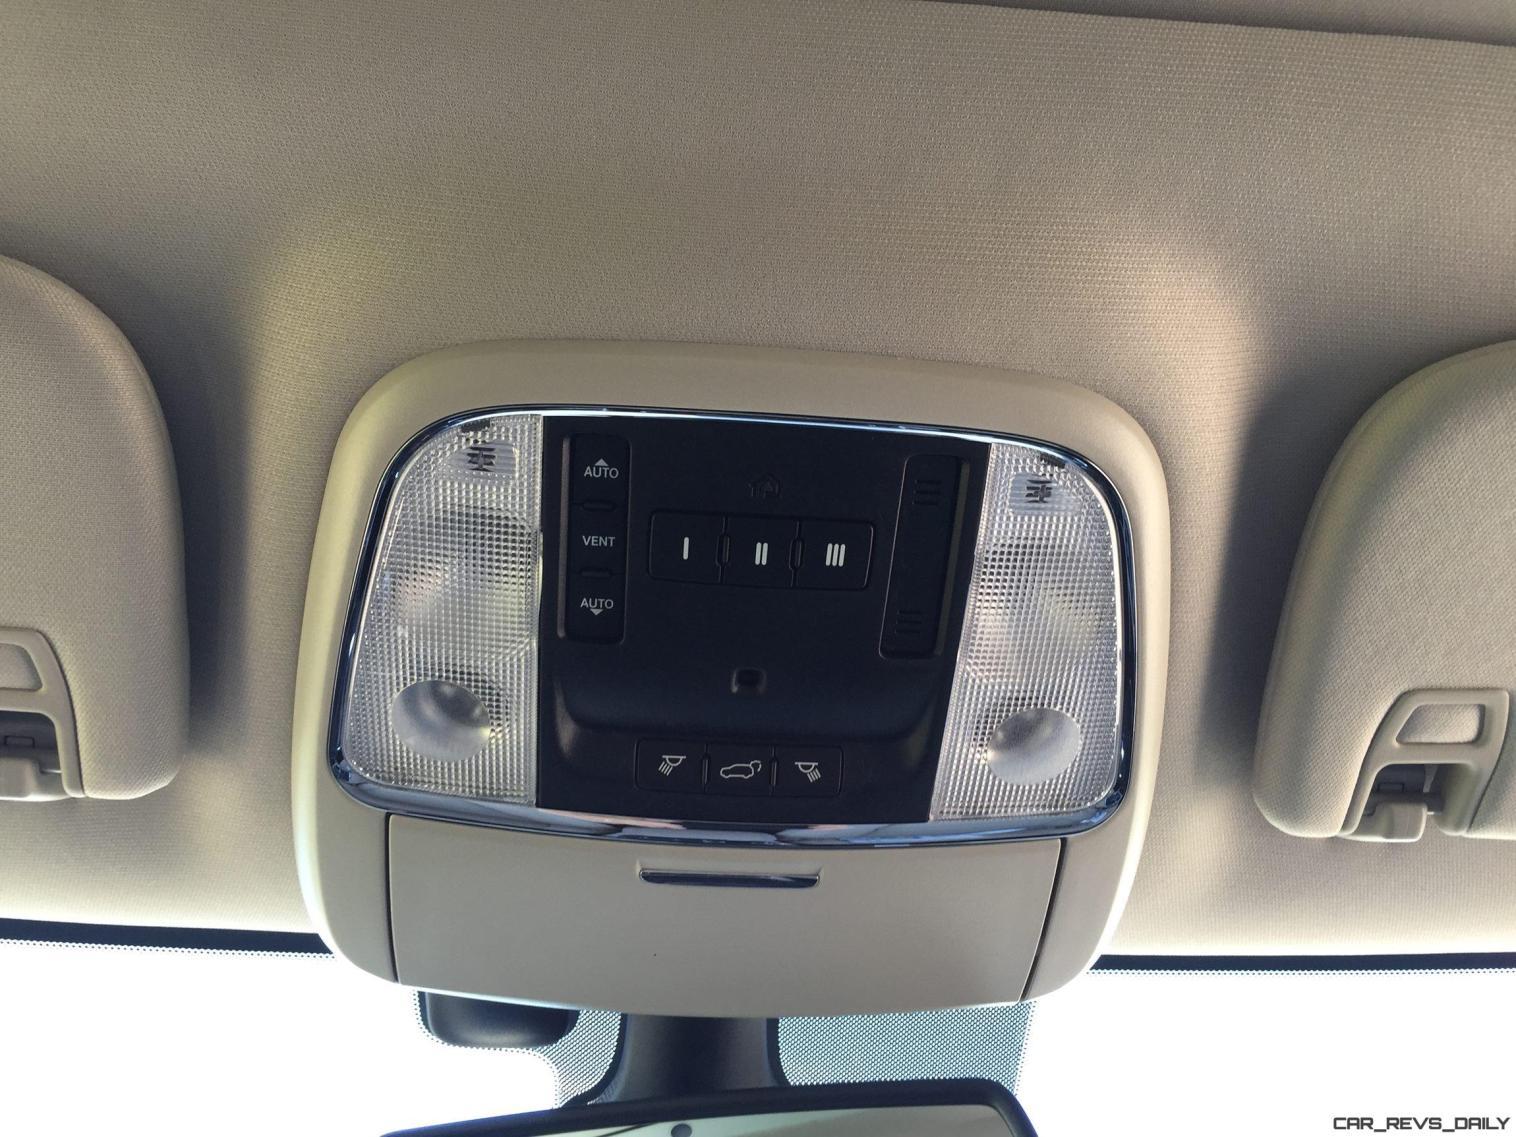 Road Test Review - 2016 Dodge DURANGO - By Tim Esterdahl 9